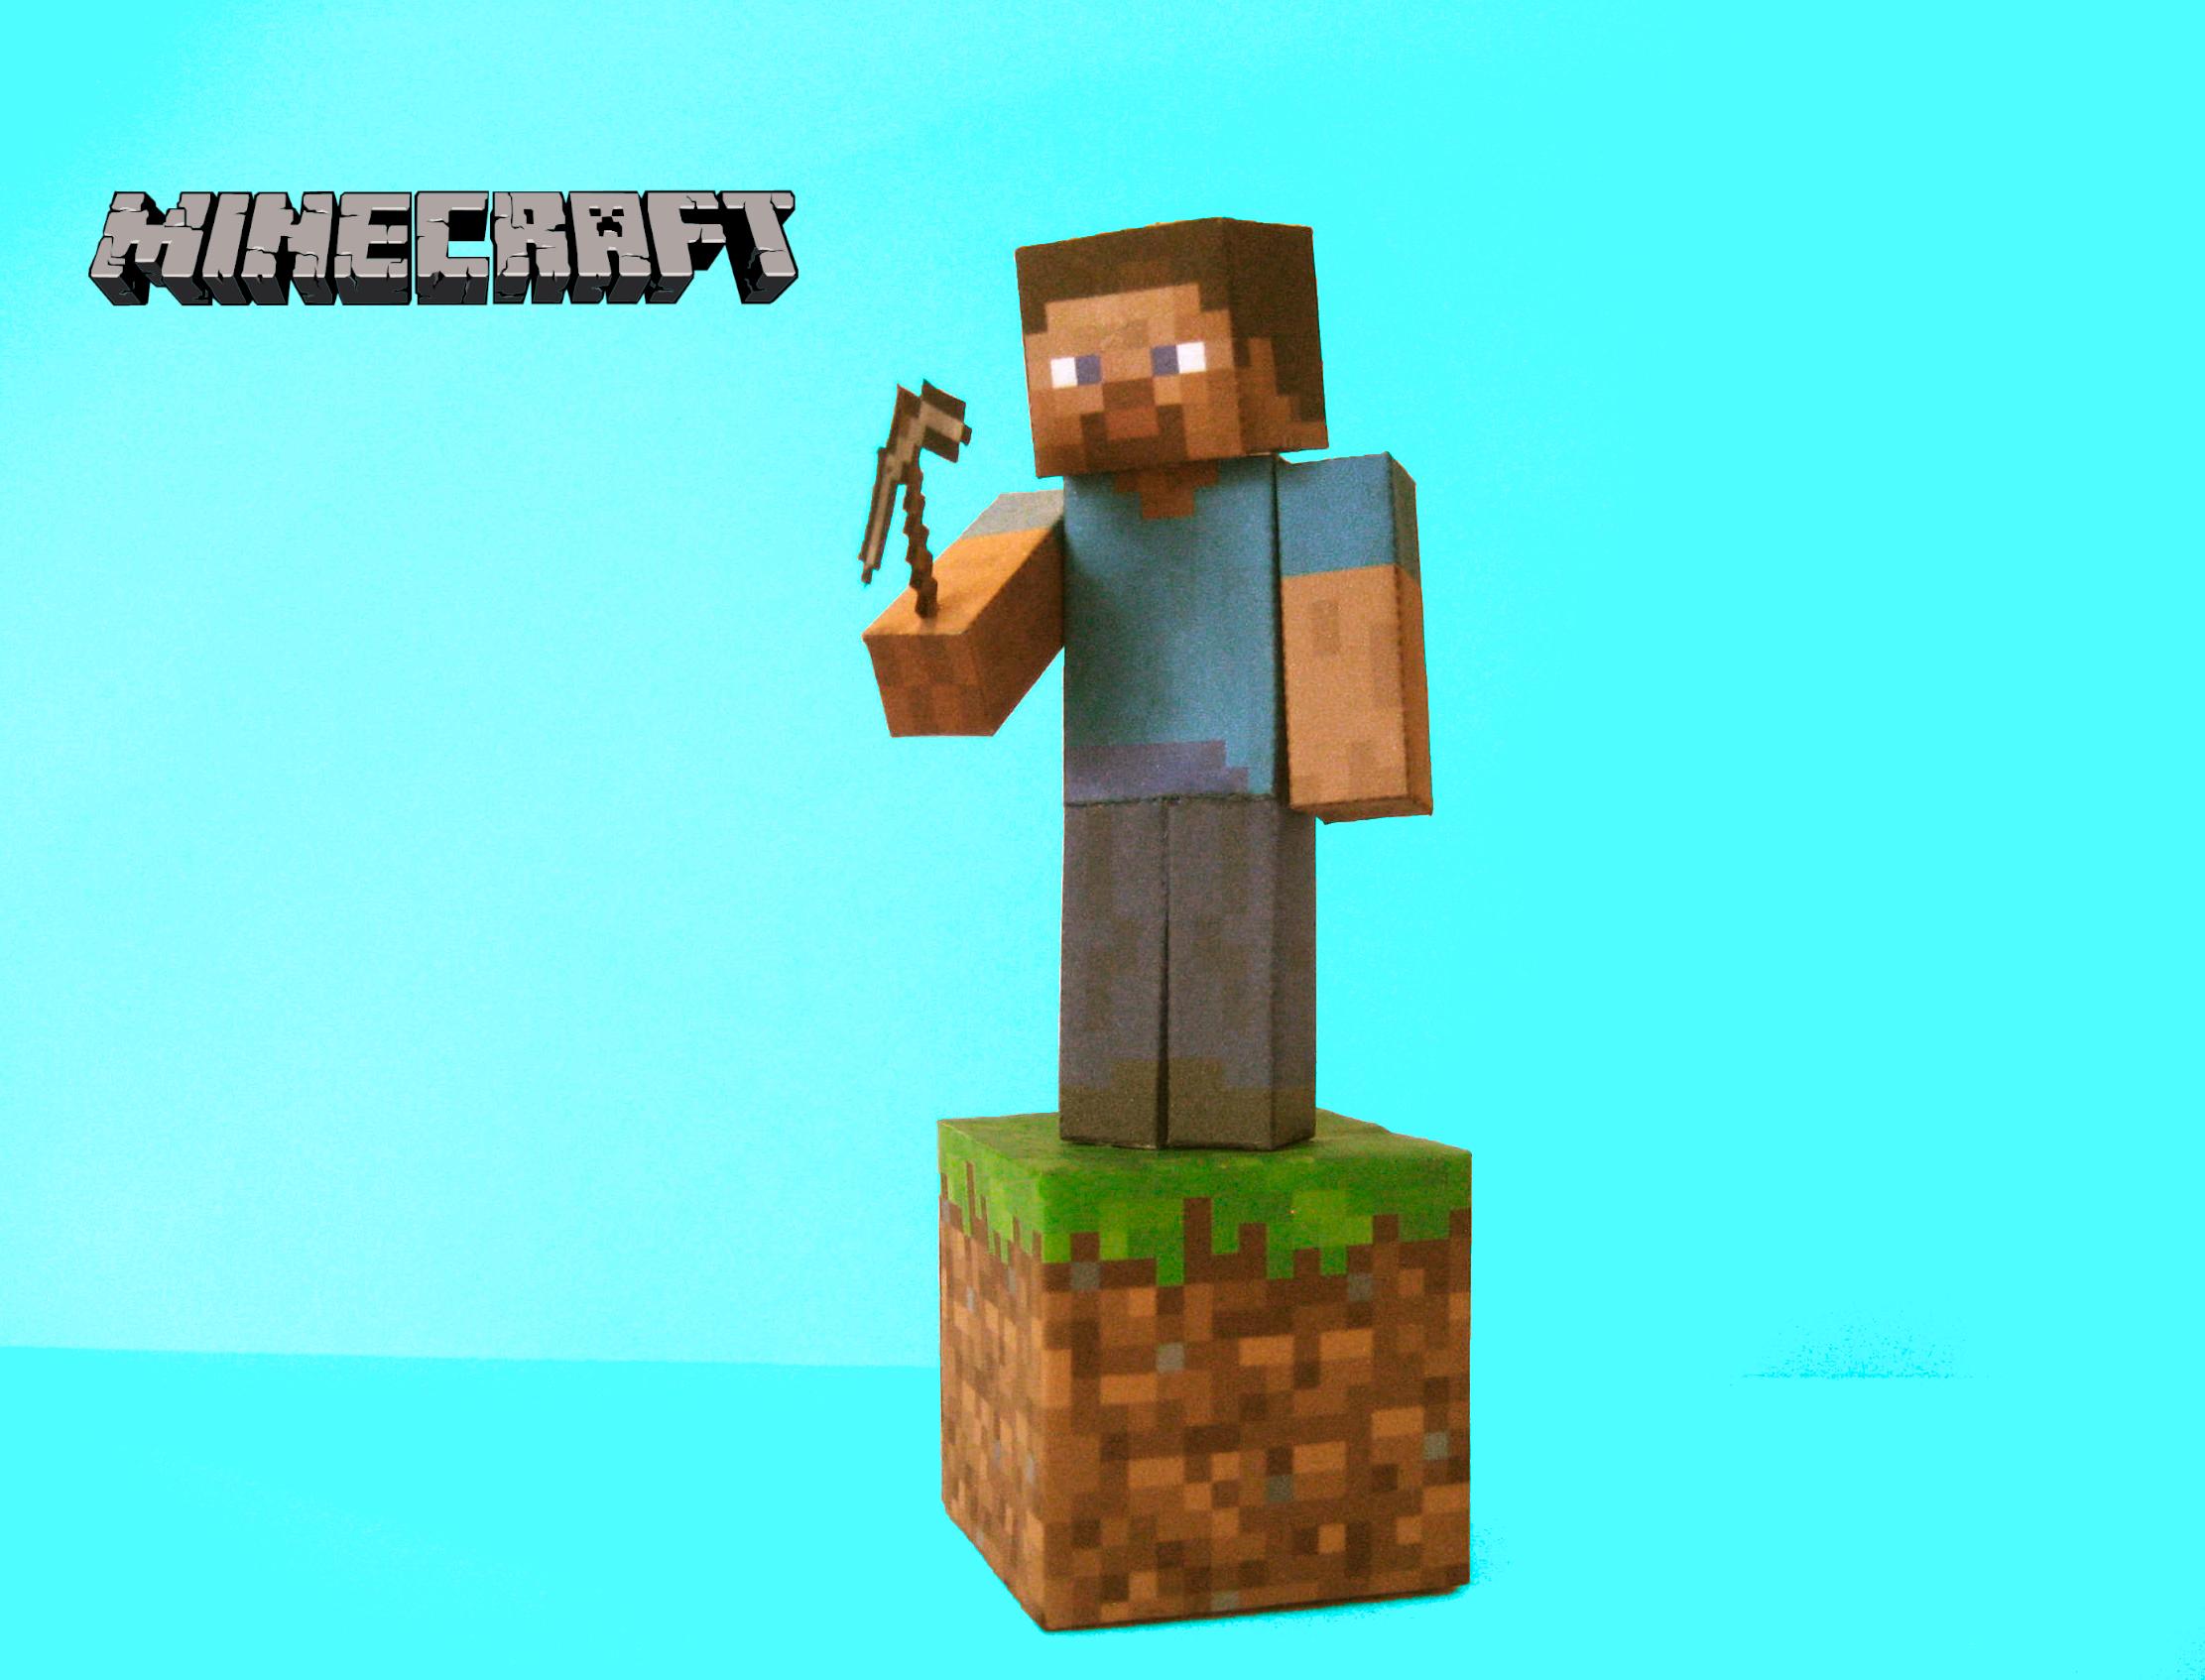 Minecraft Papercraft - Steve by poethetortoise on DeviantArt